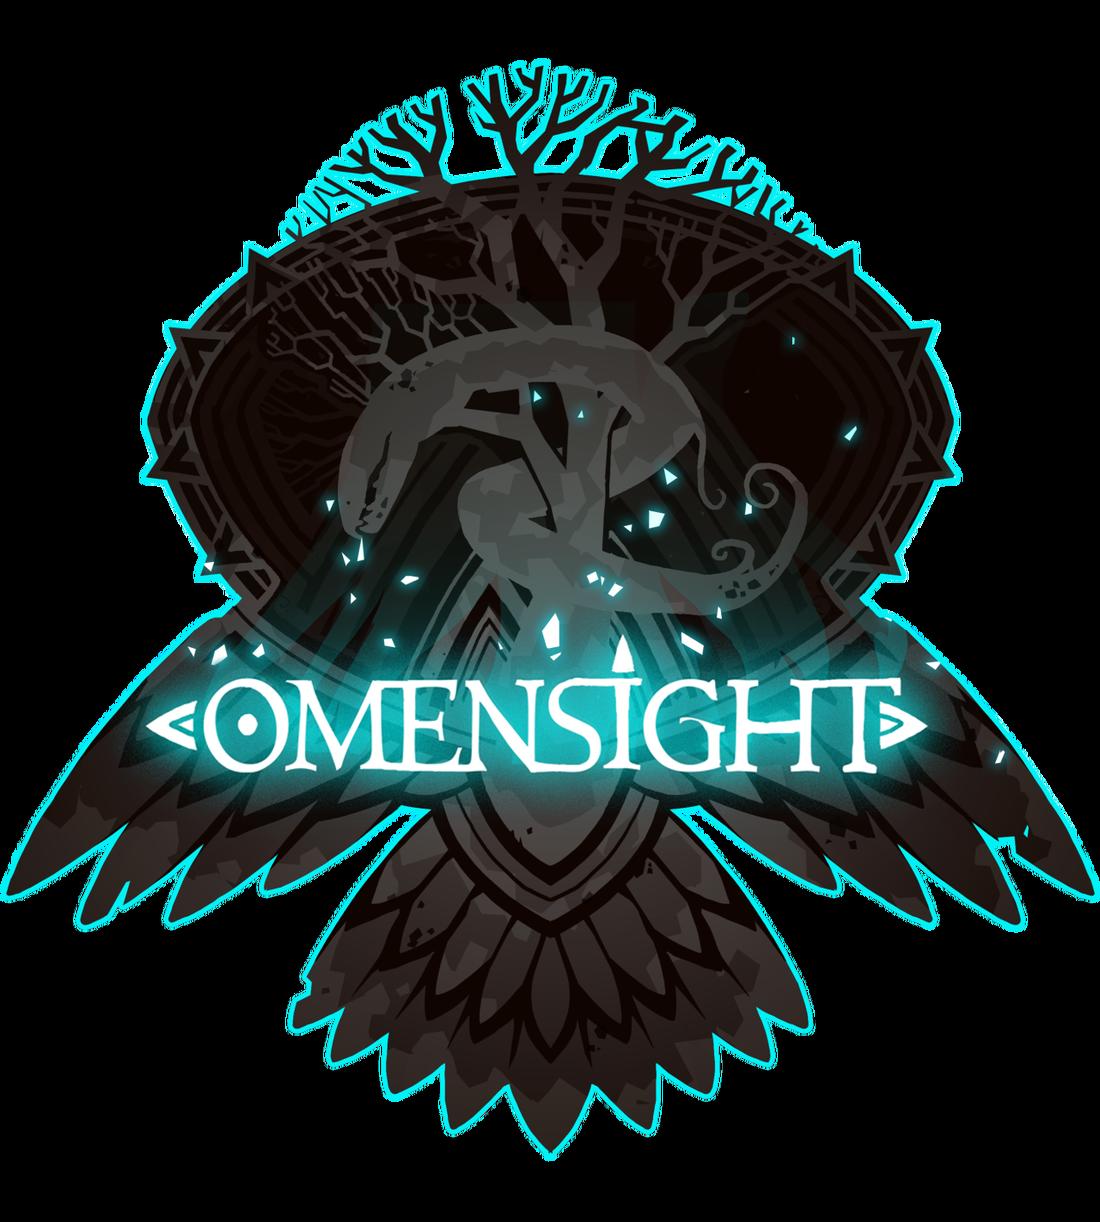 OmenSights